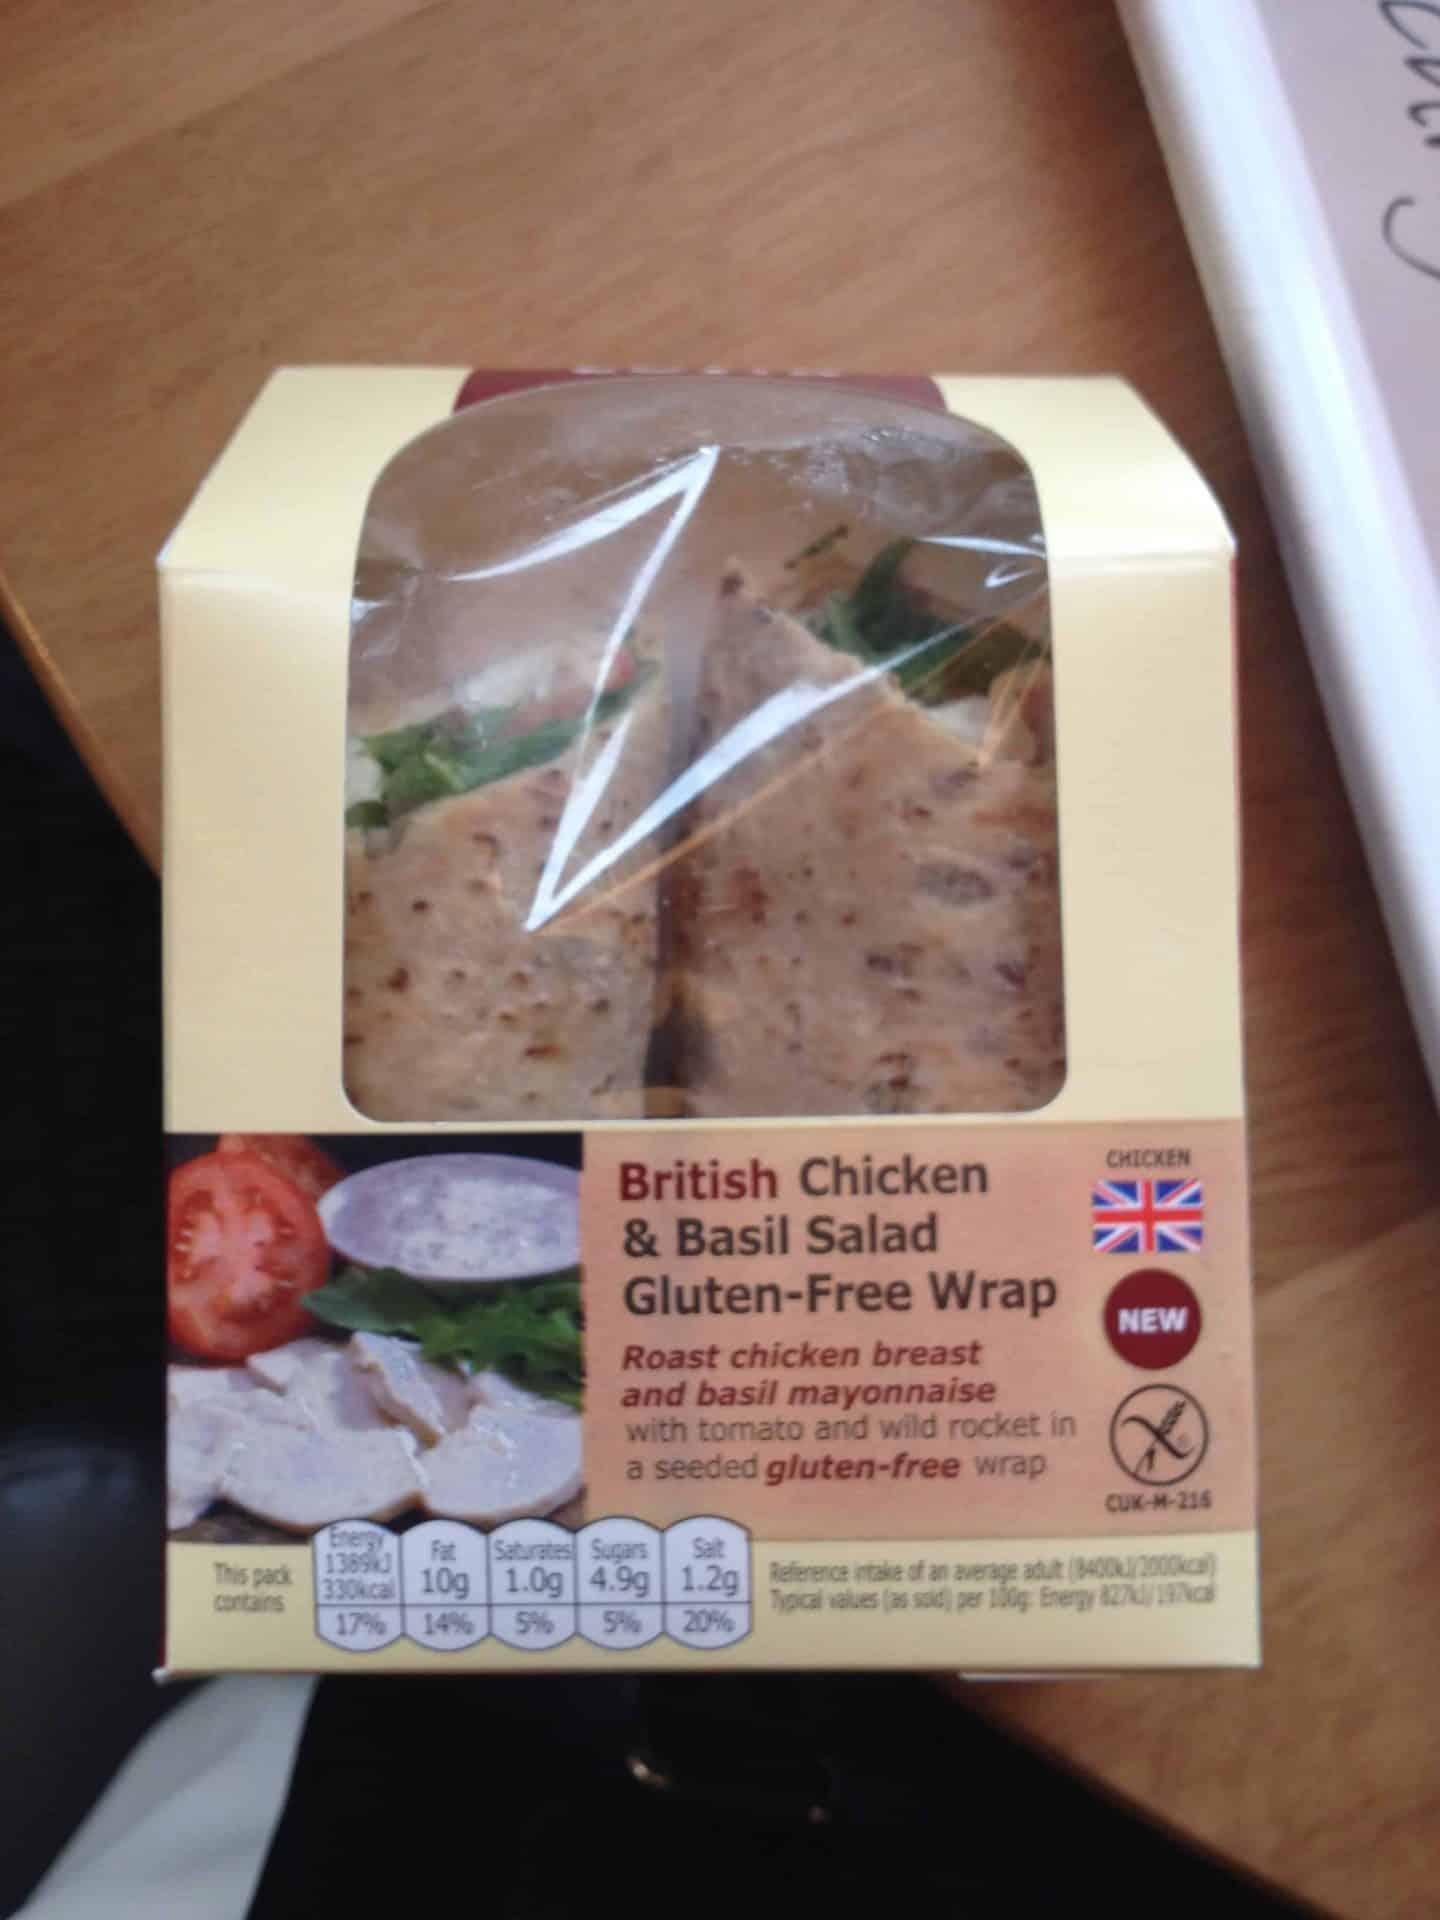 Gluten free chicken wrap from Costa Coffee